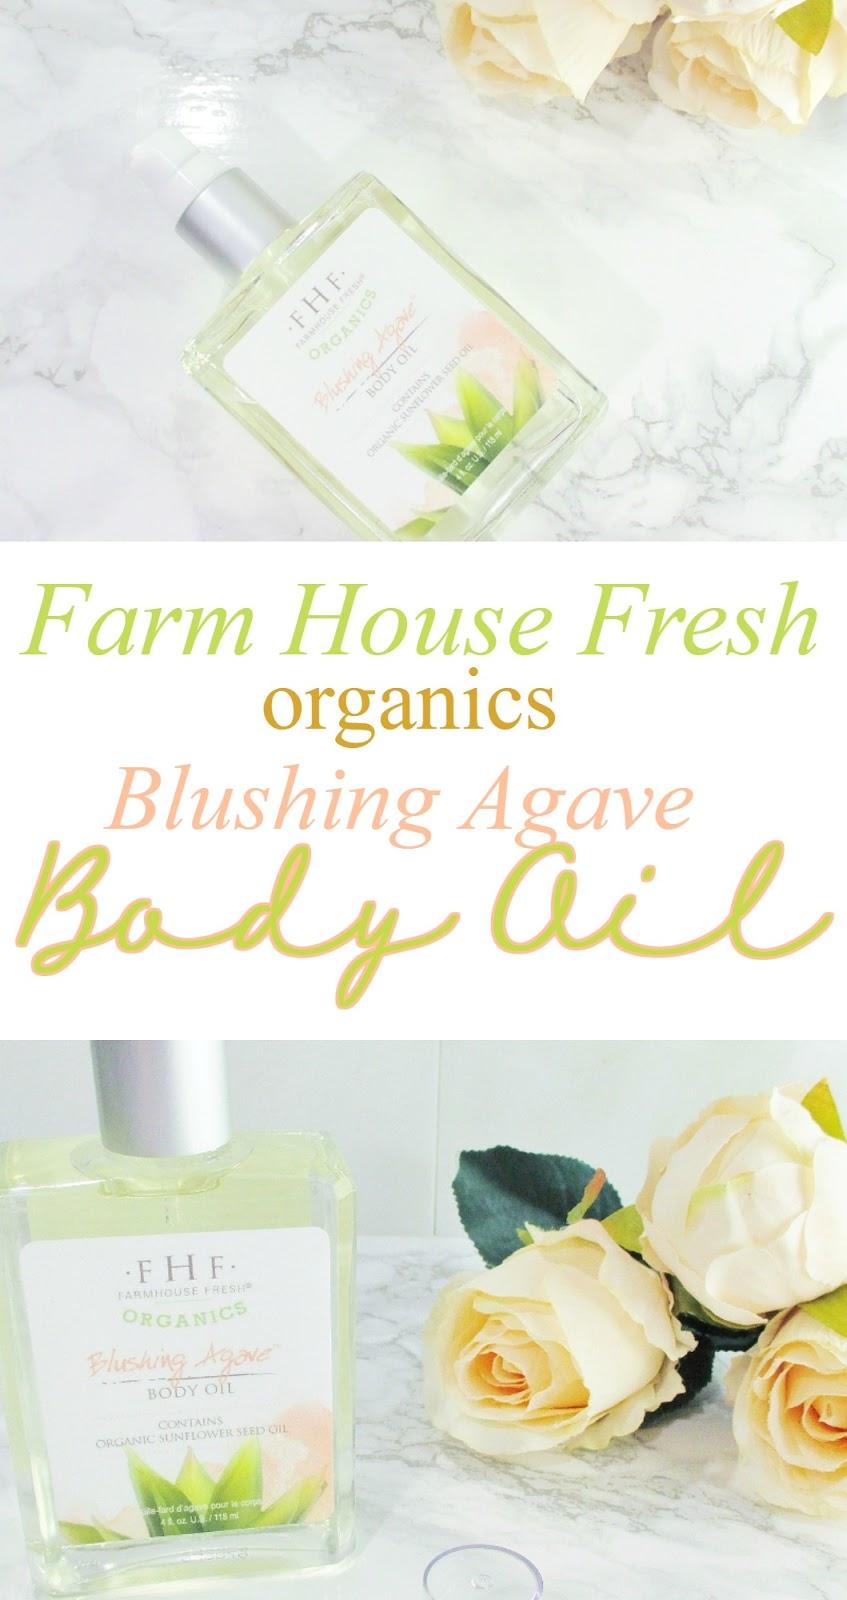 farmhouse-fresh-blushing-agave-body-oil-